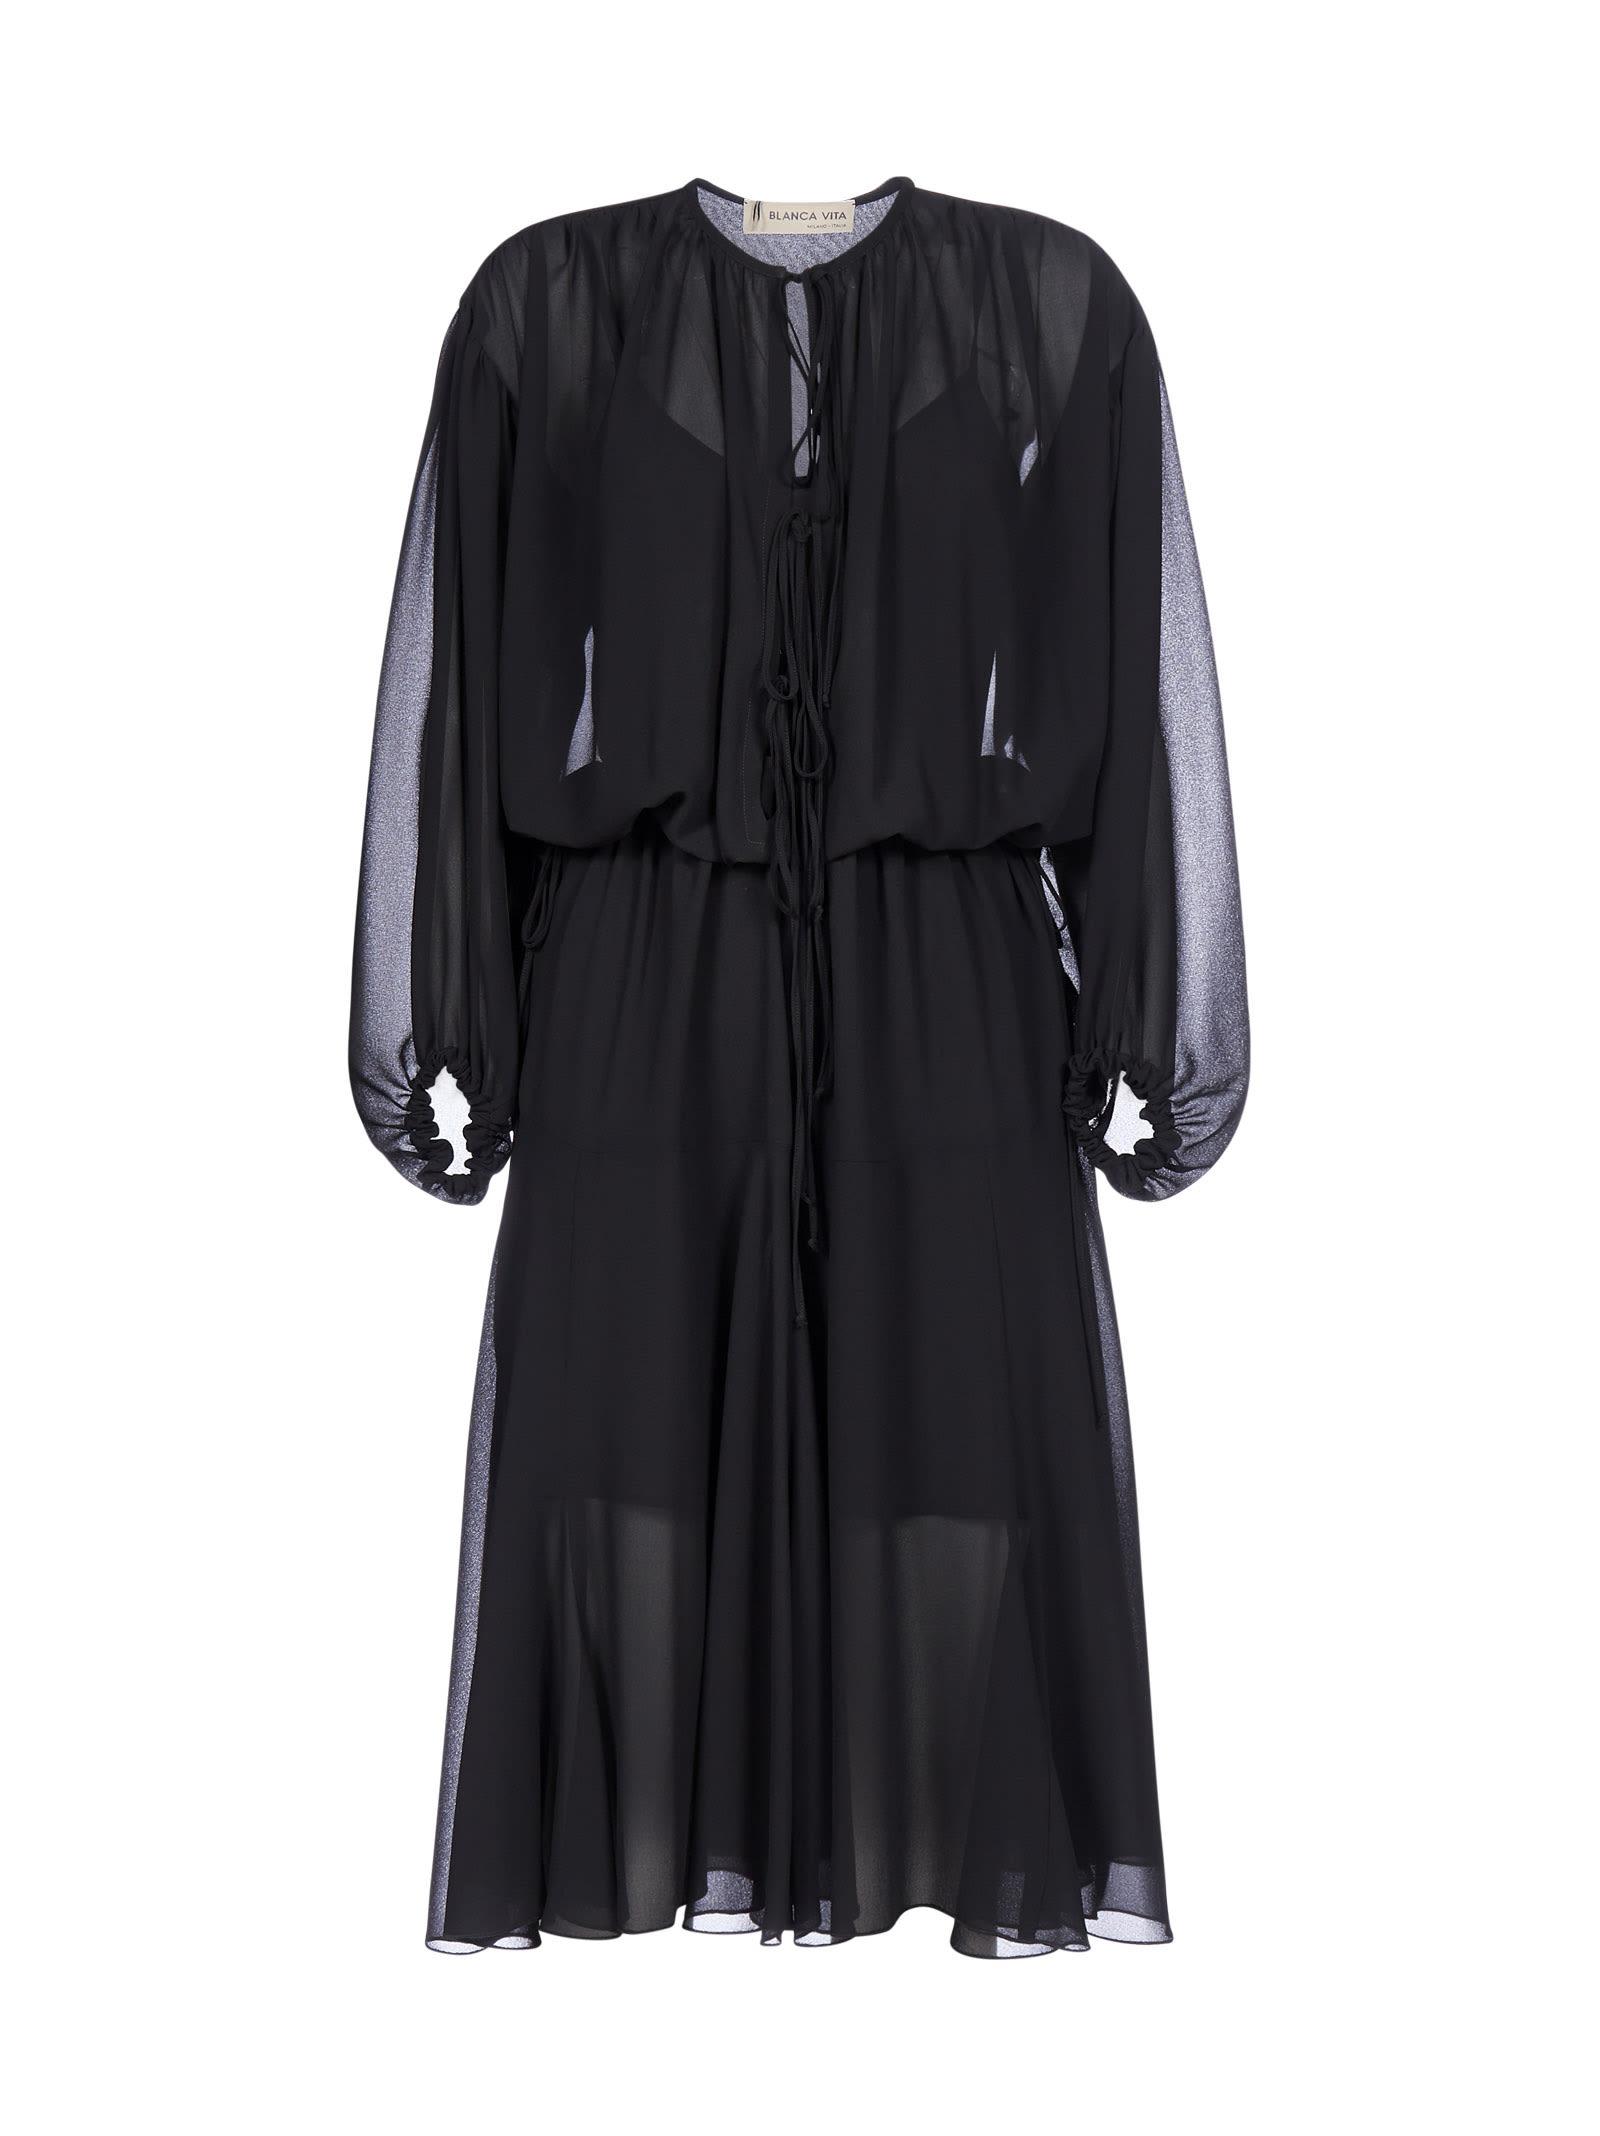 Buy Blanca Vita Dress online, shop Blanca Vita with free shipping